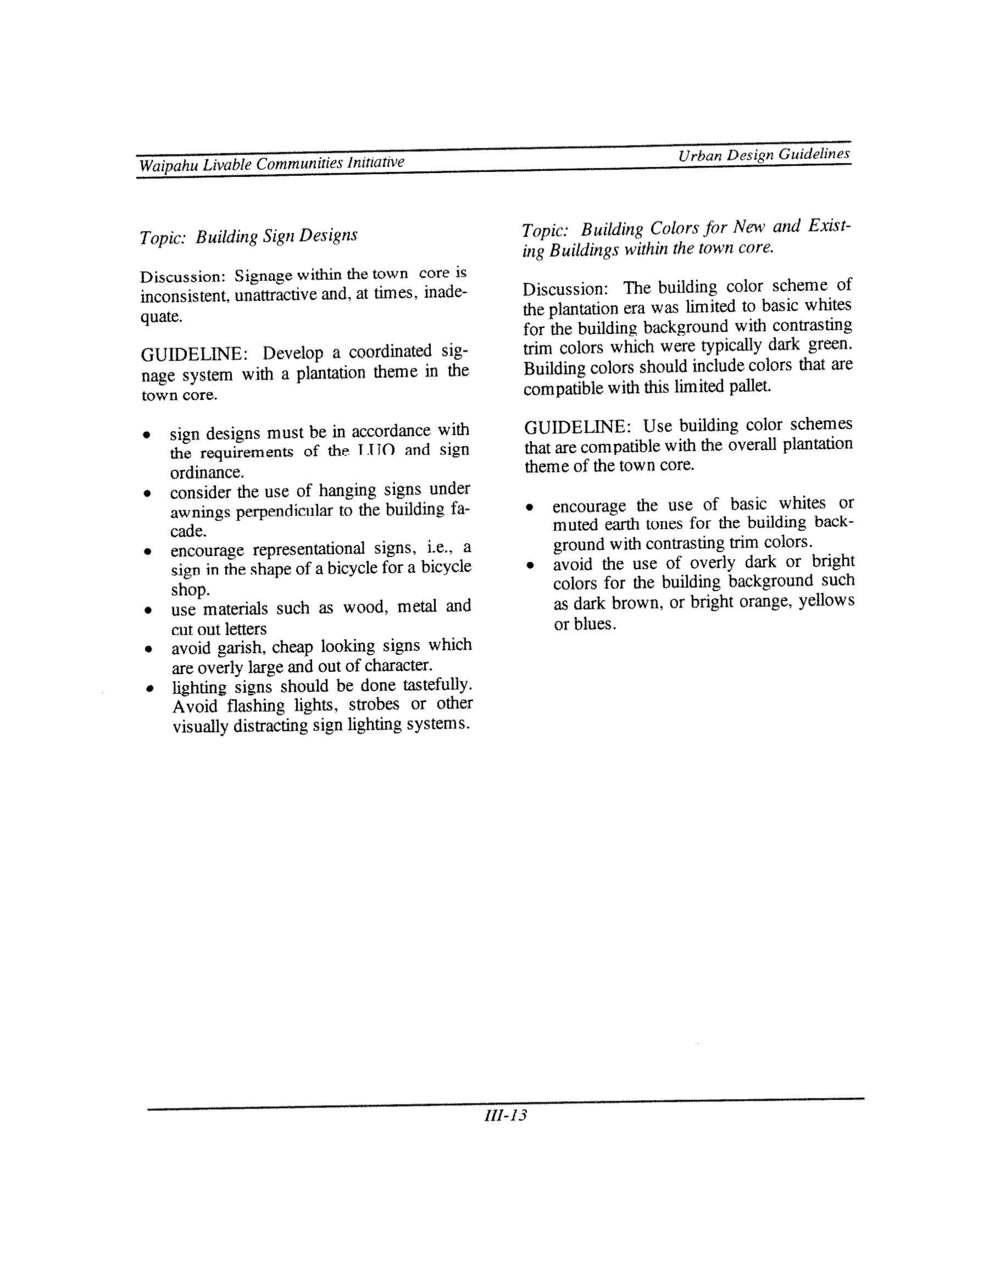 160531_WaipahuLivableCommunities(1998)_Page_103.jpg